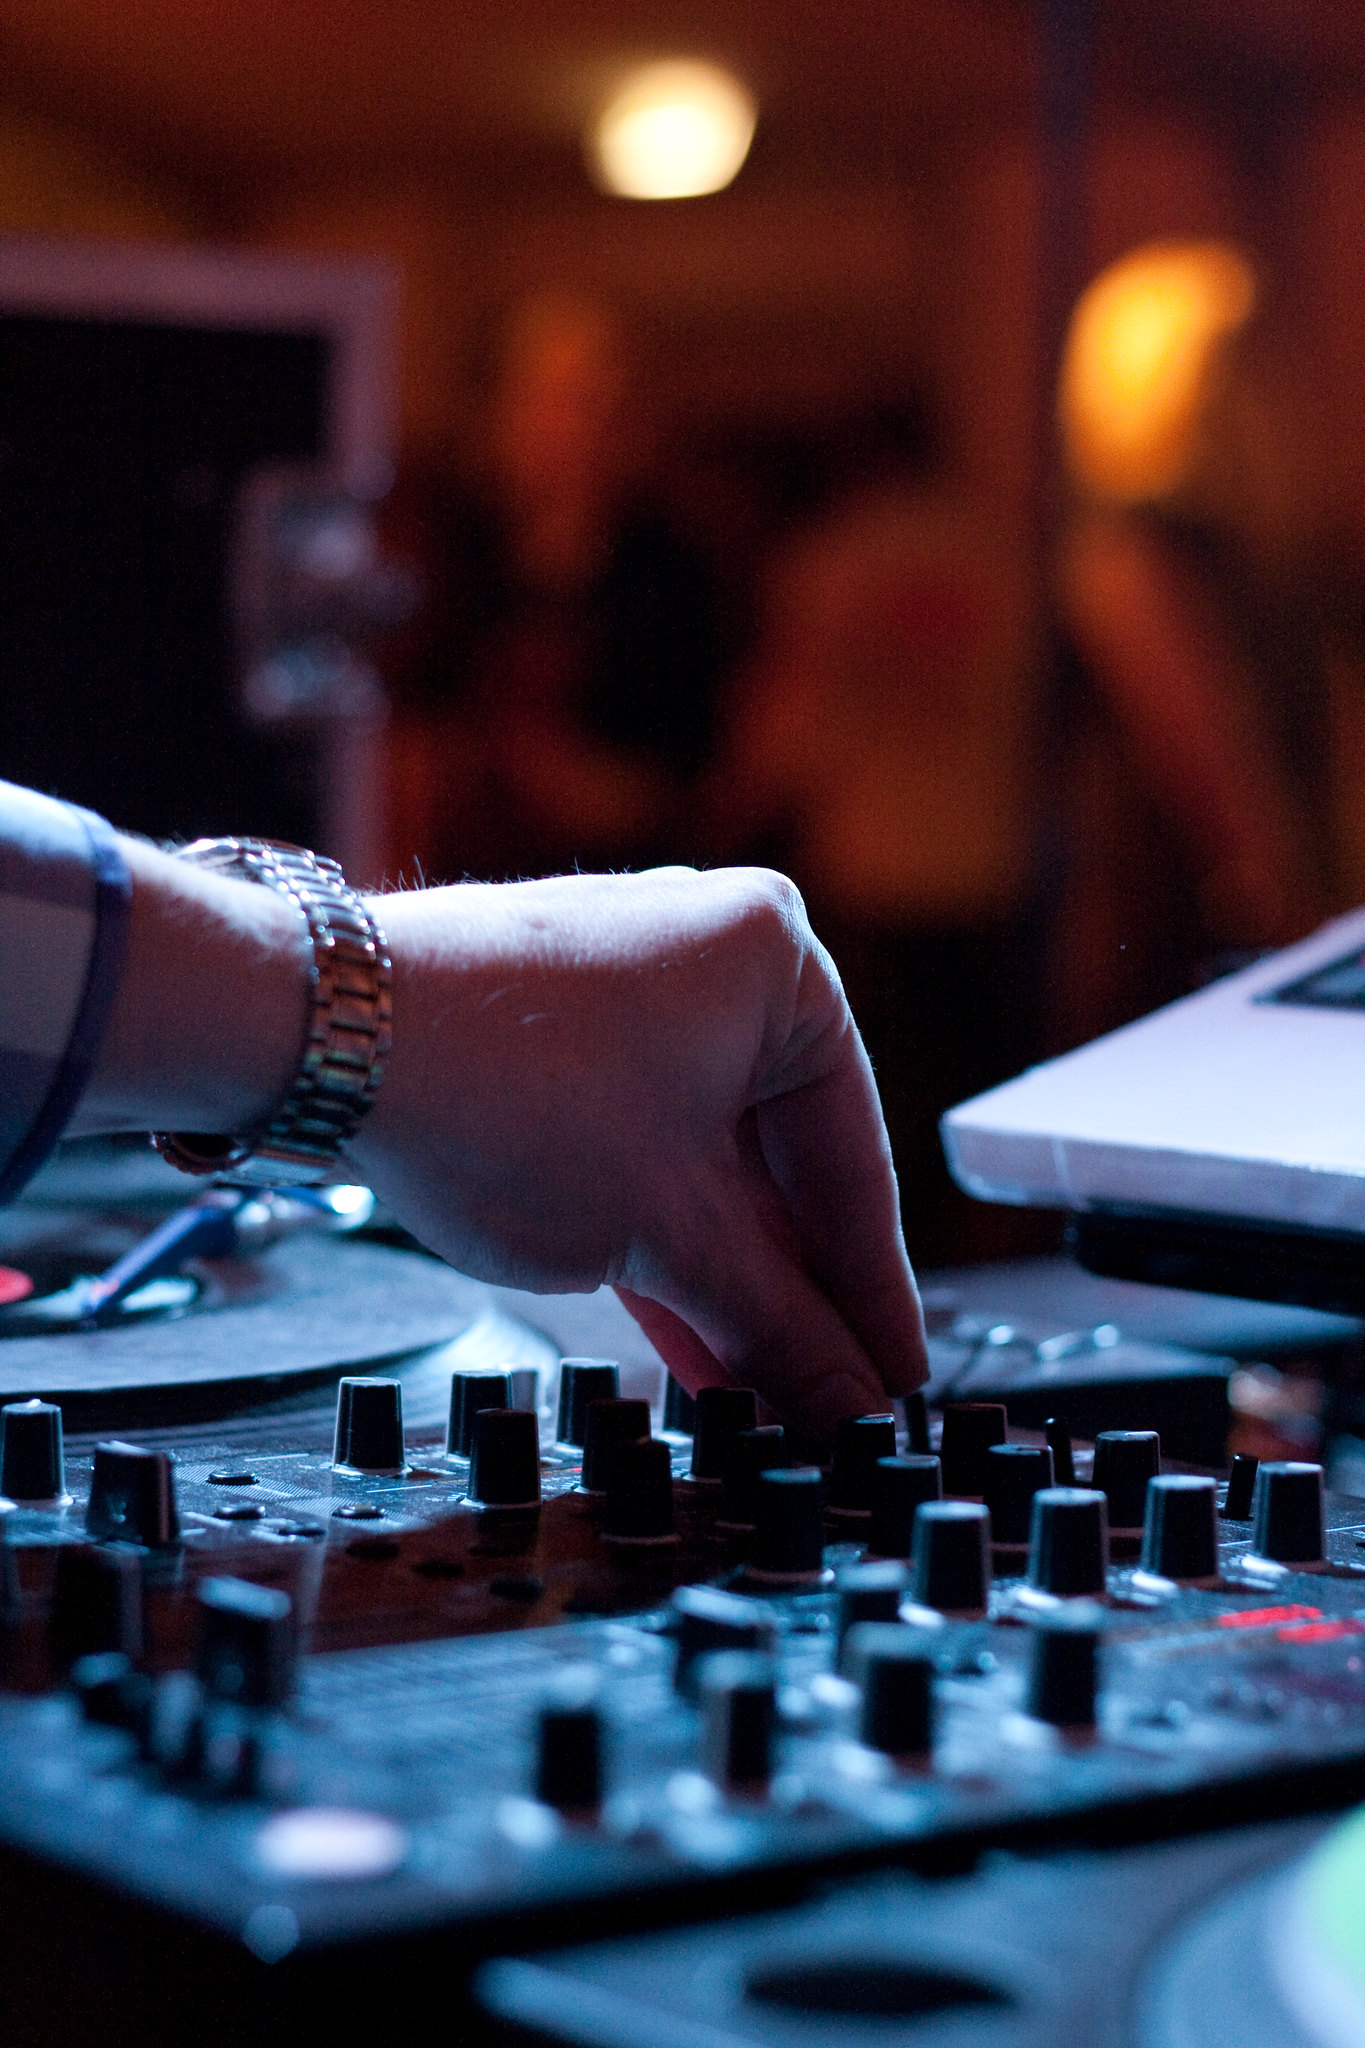 https://www.lightstalking.com/wp-content/uploads/mixing-mixer-party-dance-music-creative-commons.jpg